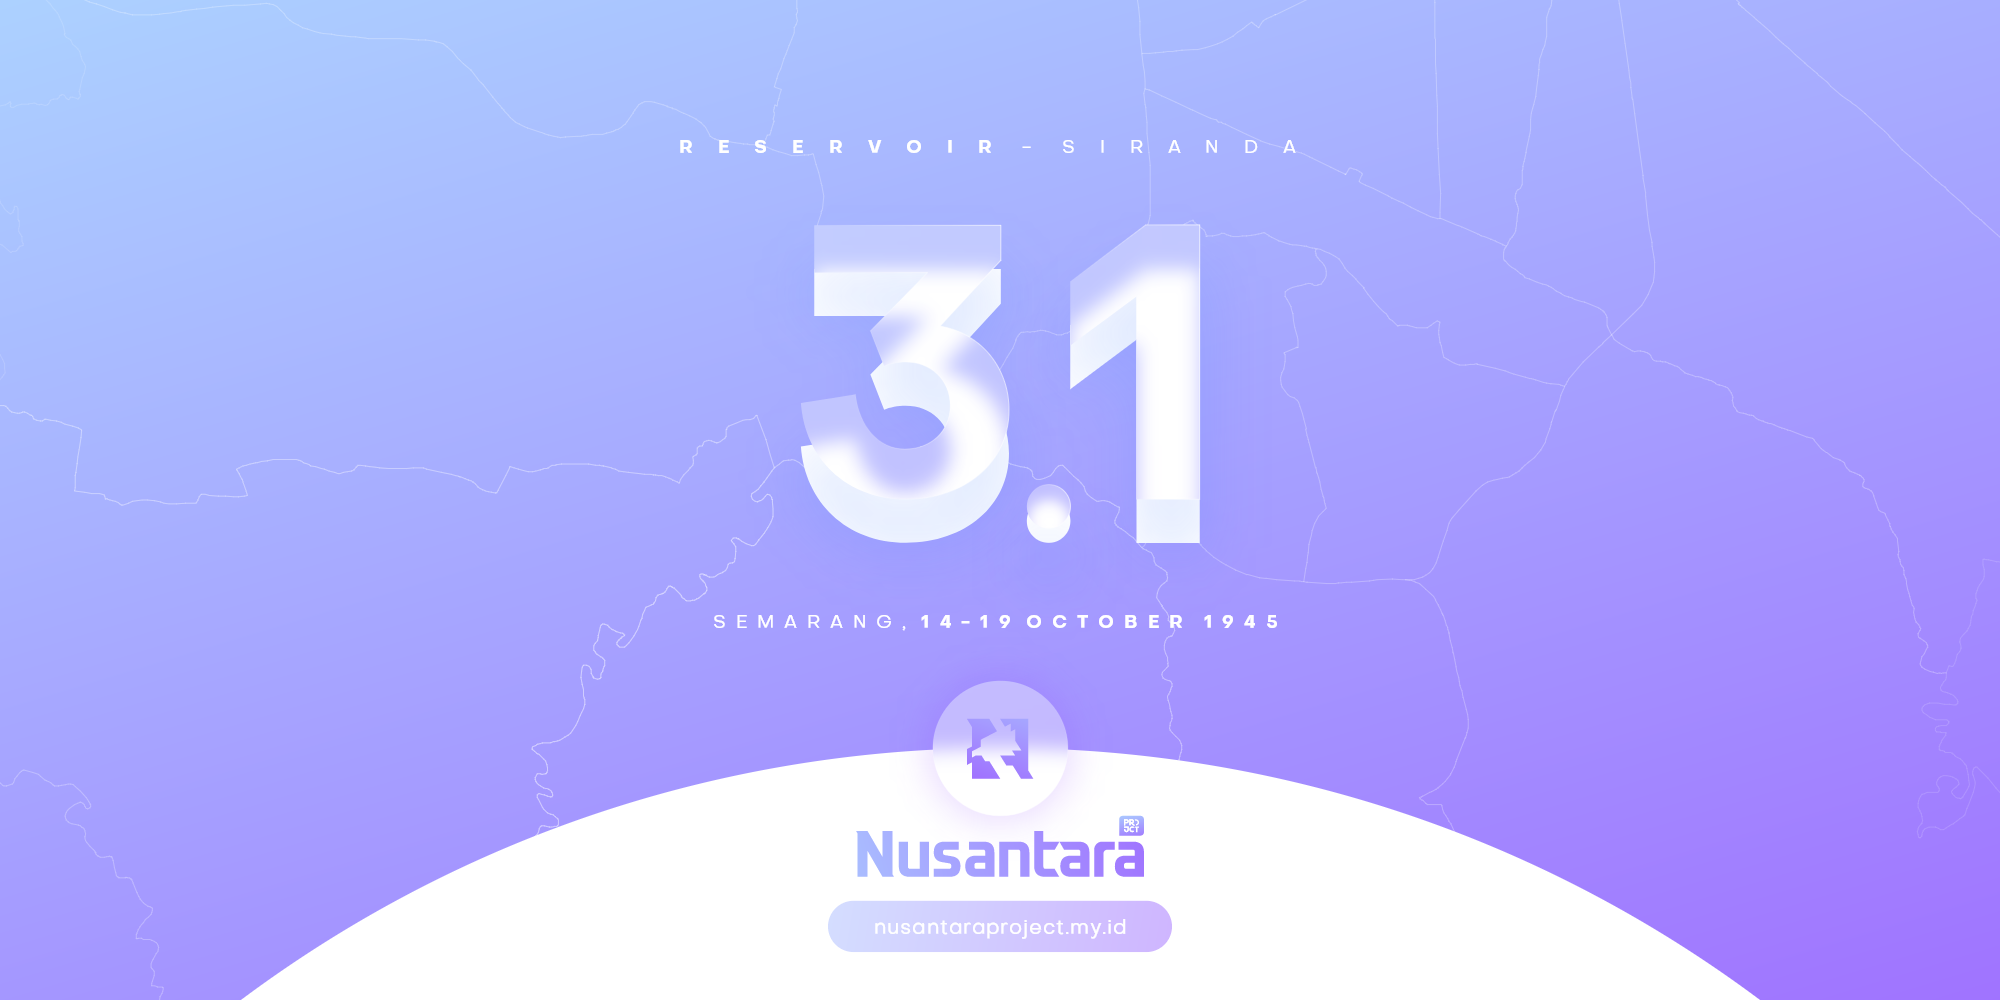 [ROM] NusantaraProject - v3.1 Reservoir [Mi 9][Cepheus]